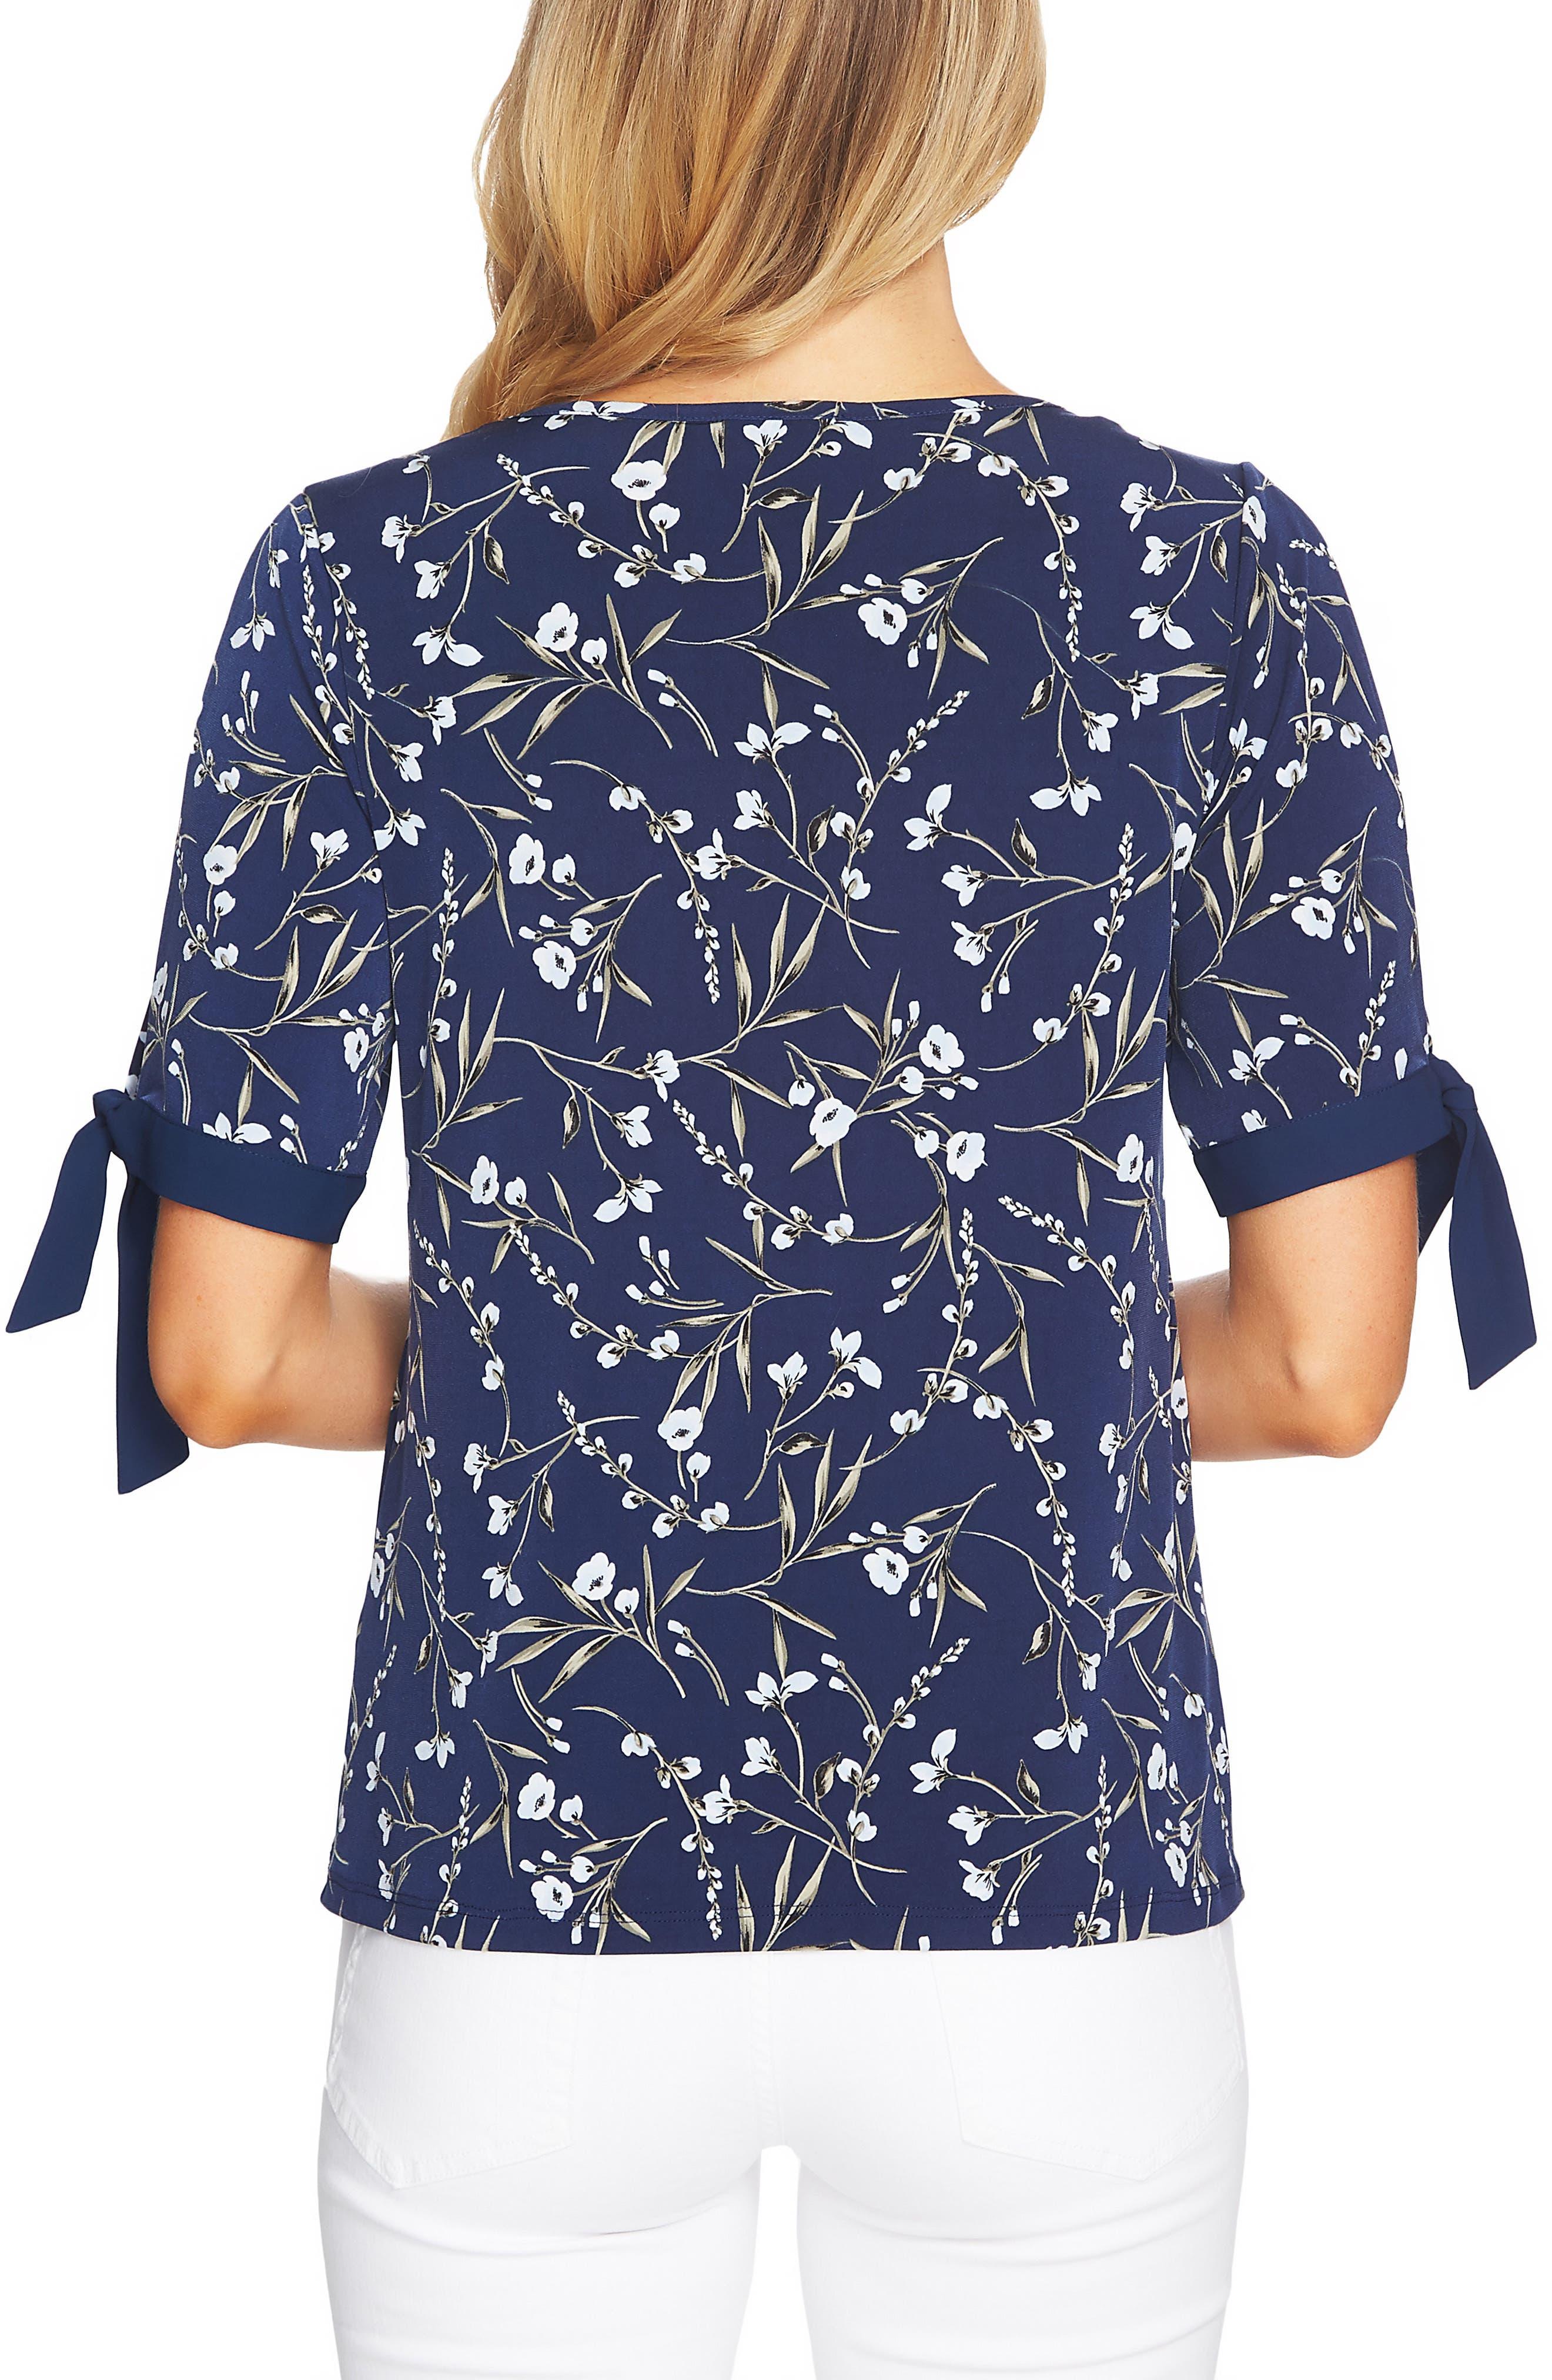 Graceful Flora Tie Sleeve Top,                             Alternate thumbnail 2, color,                             Naval Navy